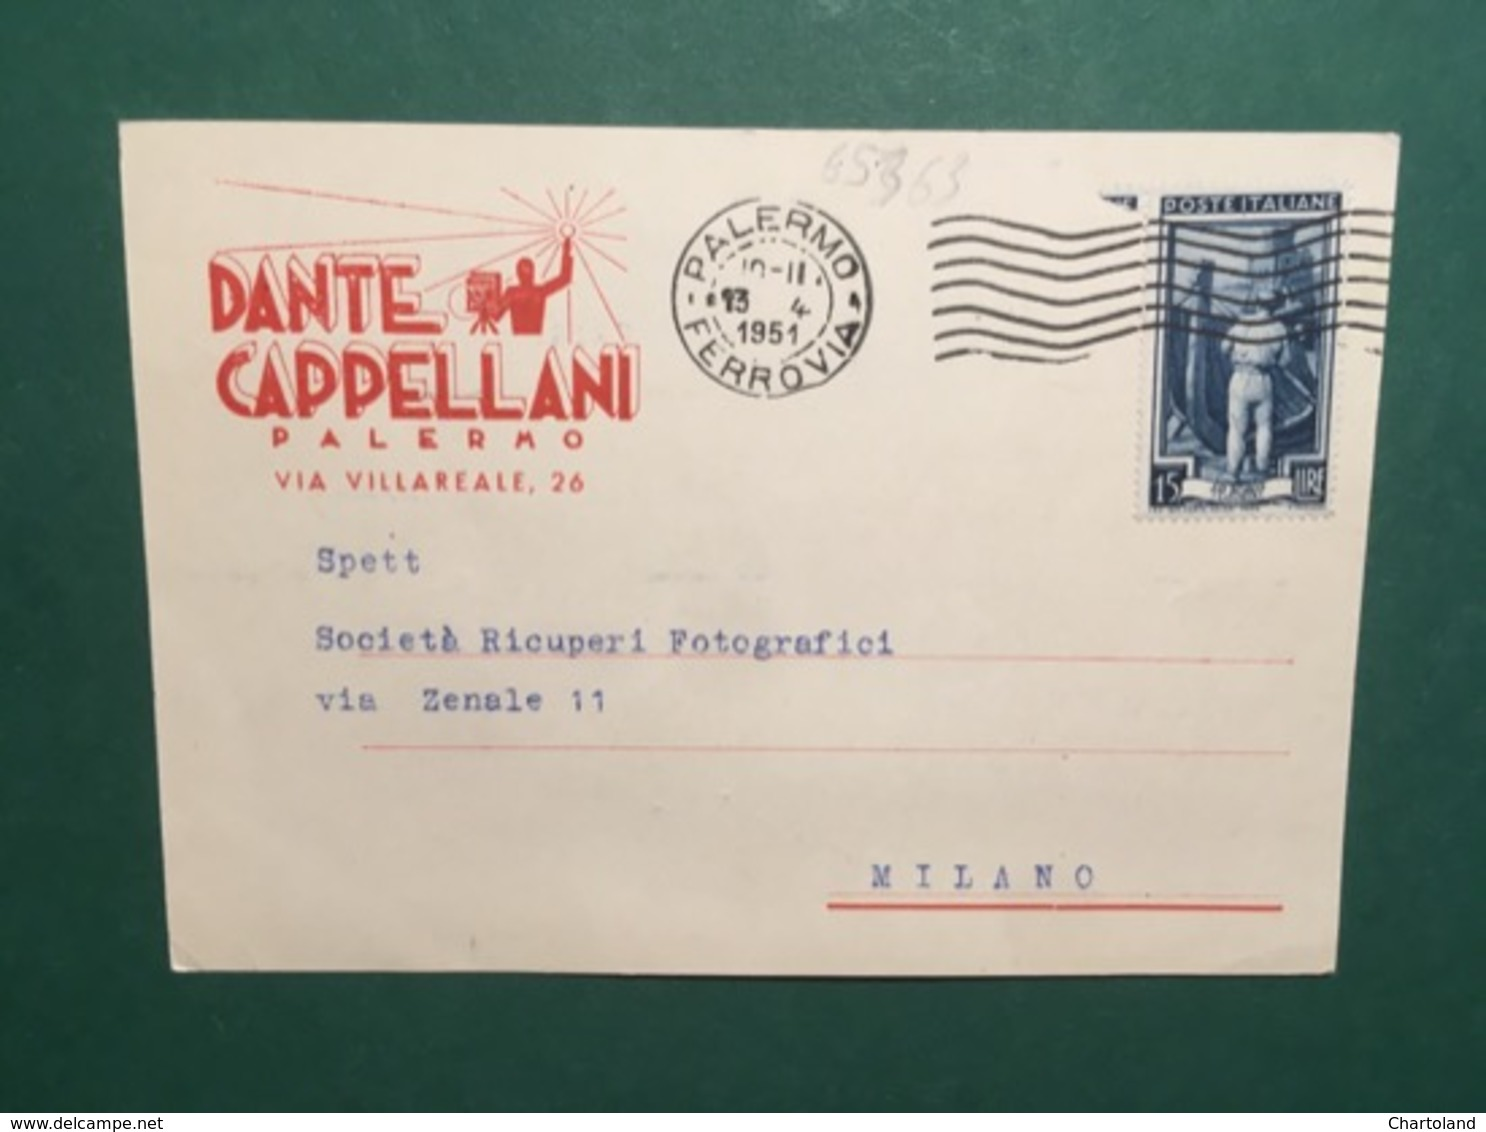 Cartolina Dante Cappellani - Palermo - Via Villareale - 1951 - Cartoline